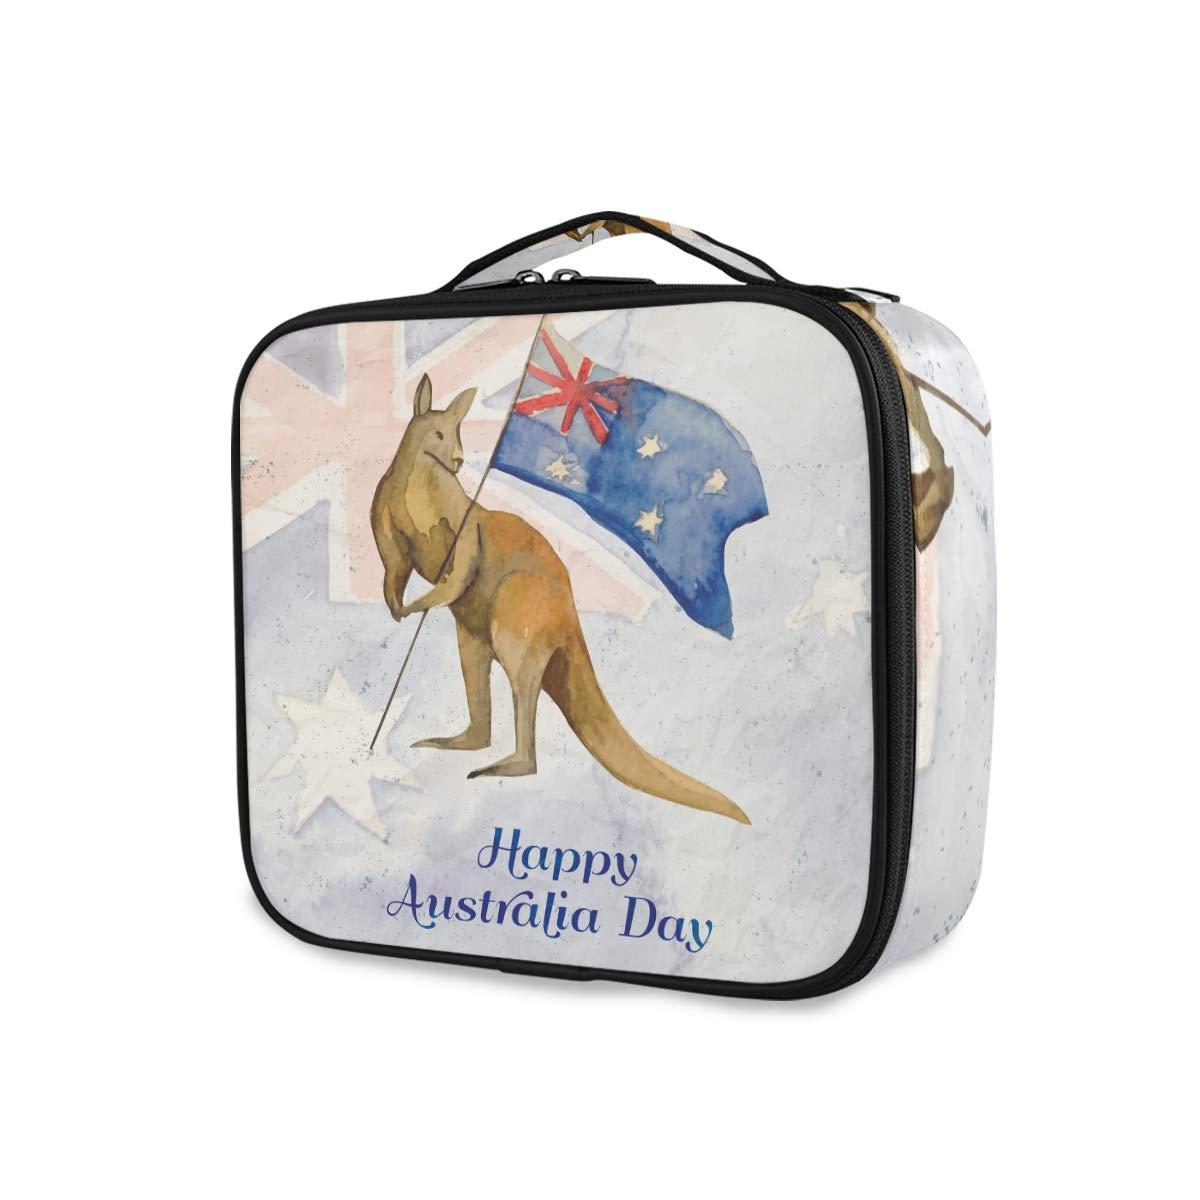 Kangaroo Australia Flag Makeup Train Case Travel Makeup Bag Cosmetic Artist Bags Organizer with Adjustable Dividers Gift for Women Girls